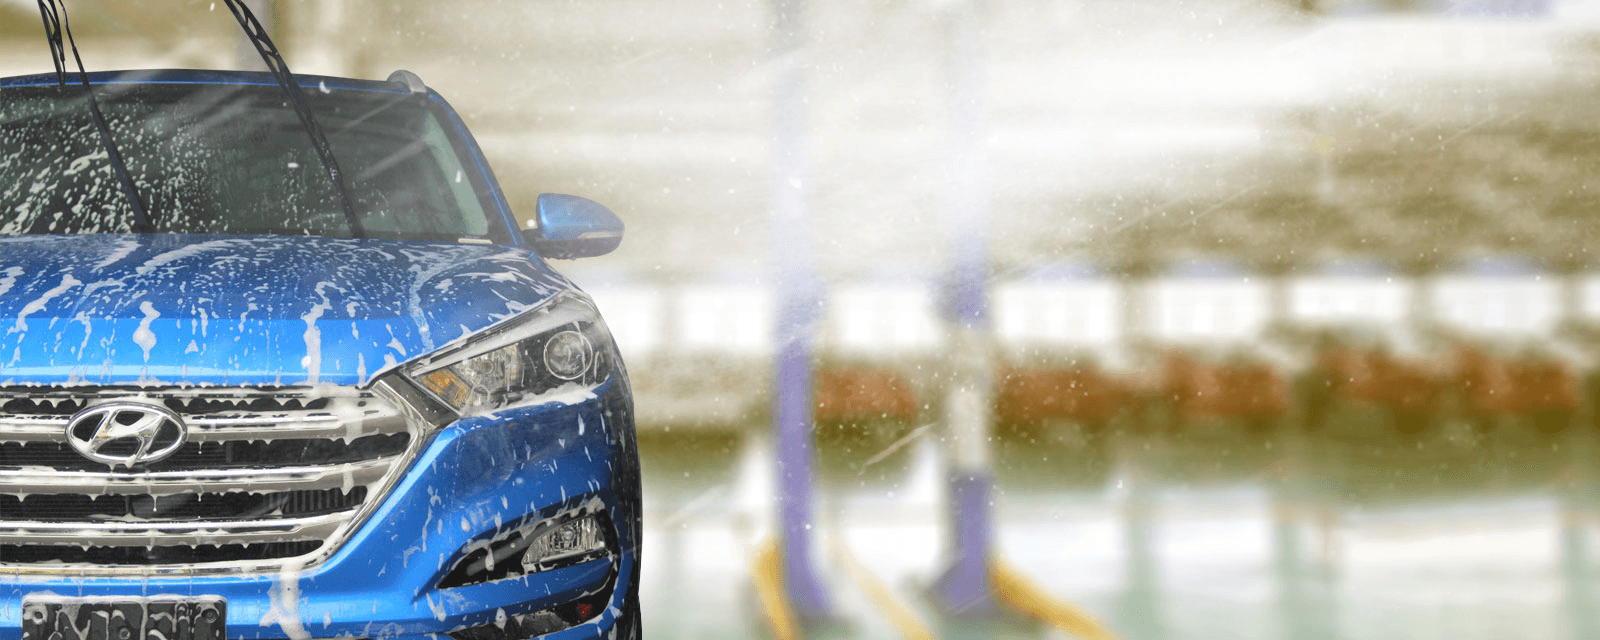 Hyundai of Wentzville Detailing Special